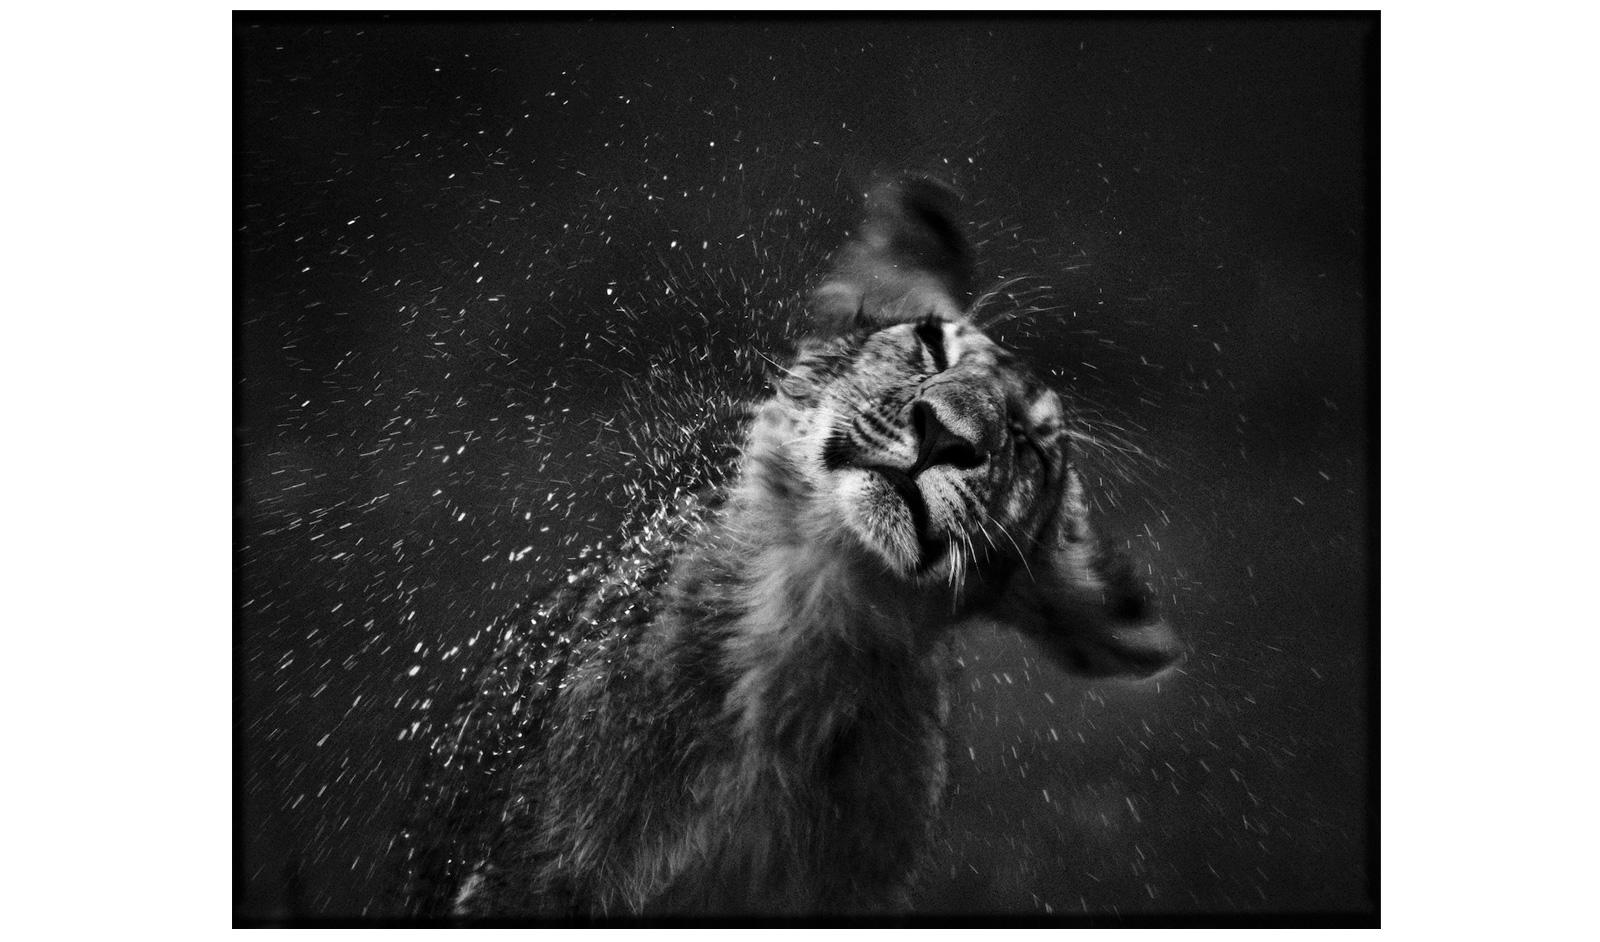 Чёрно белая картинка бобренка 21 фотография